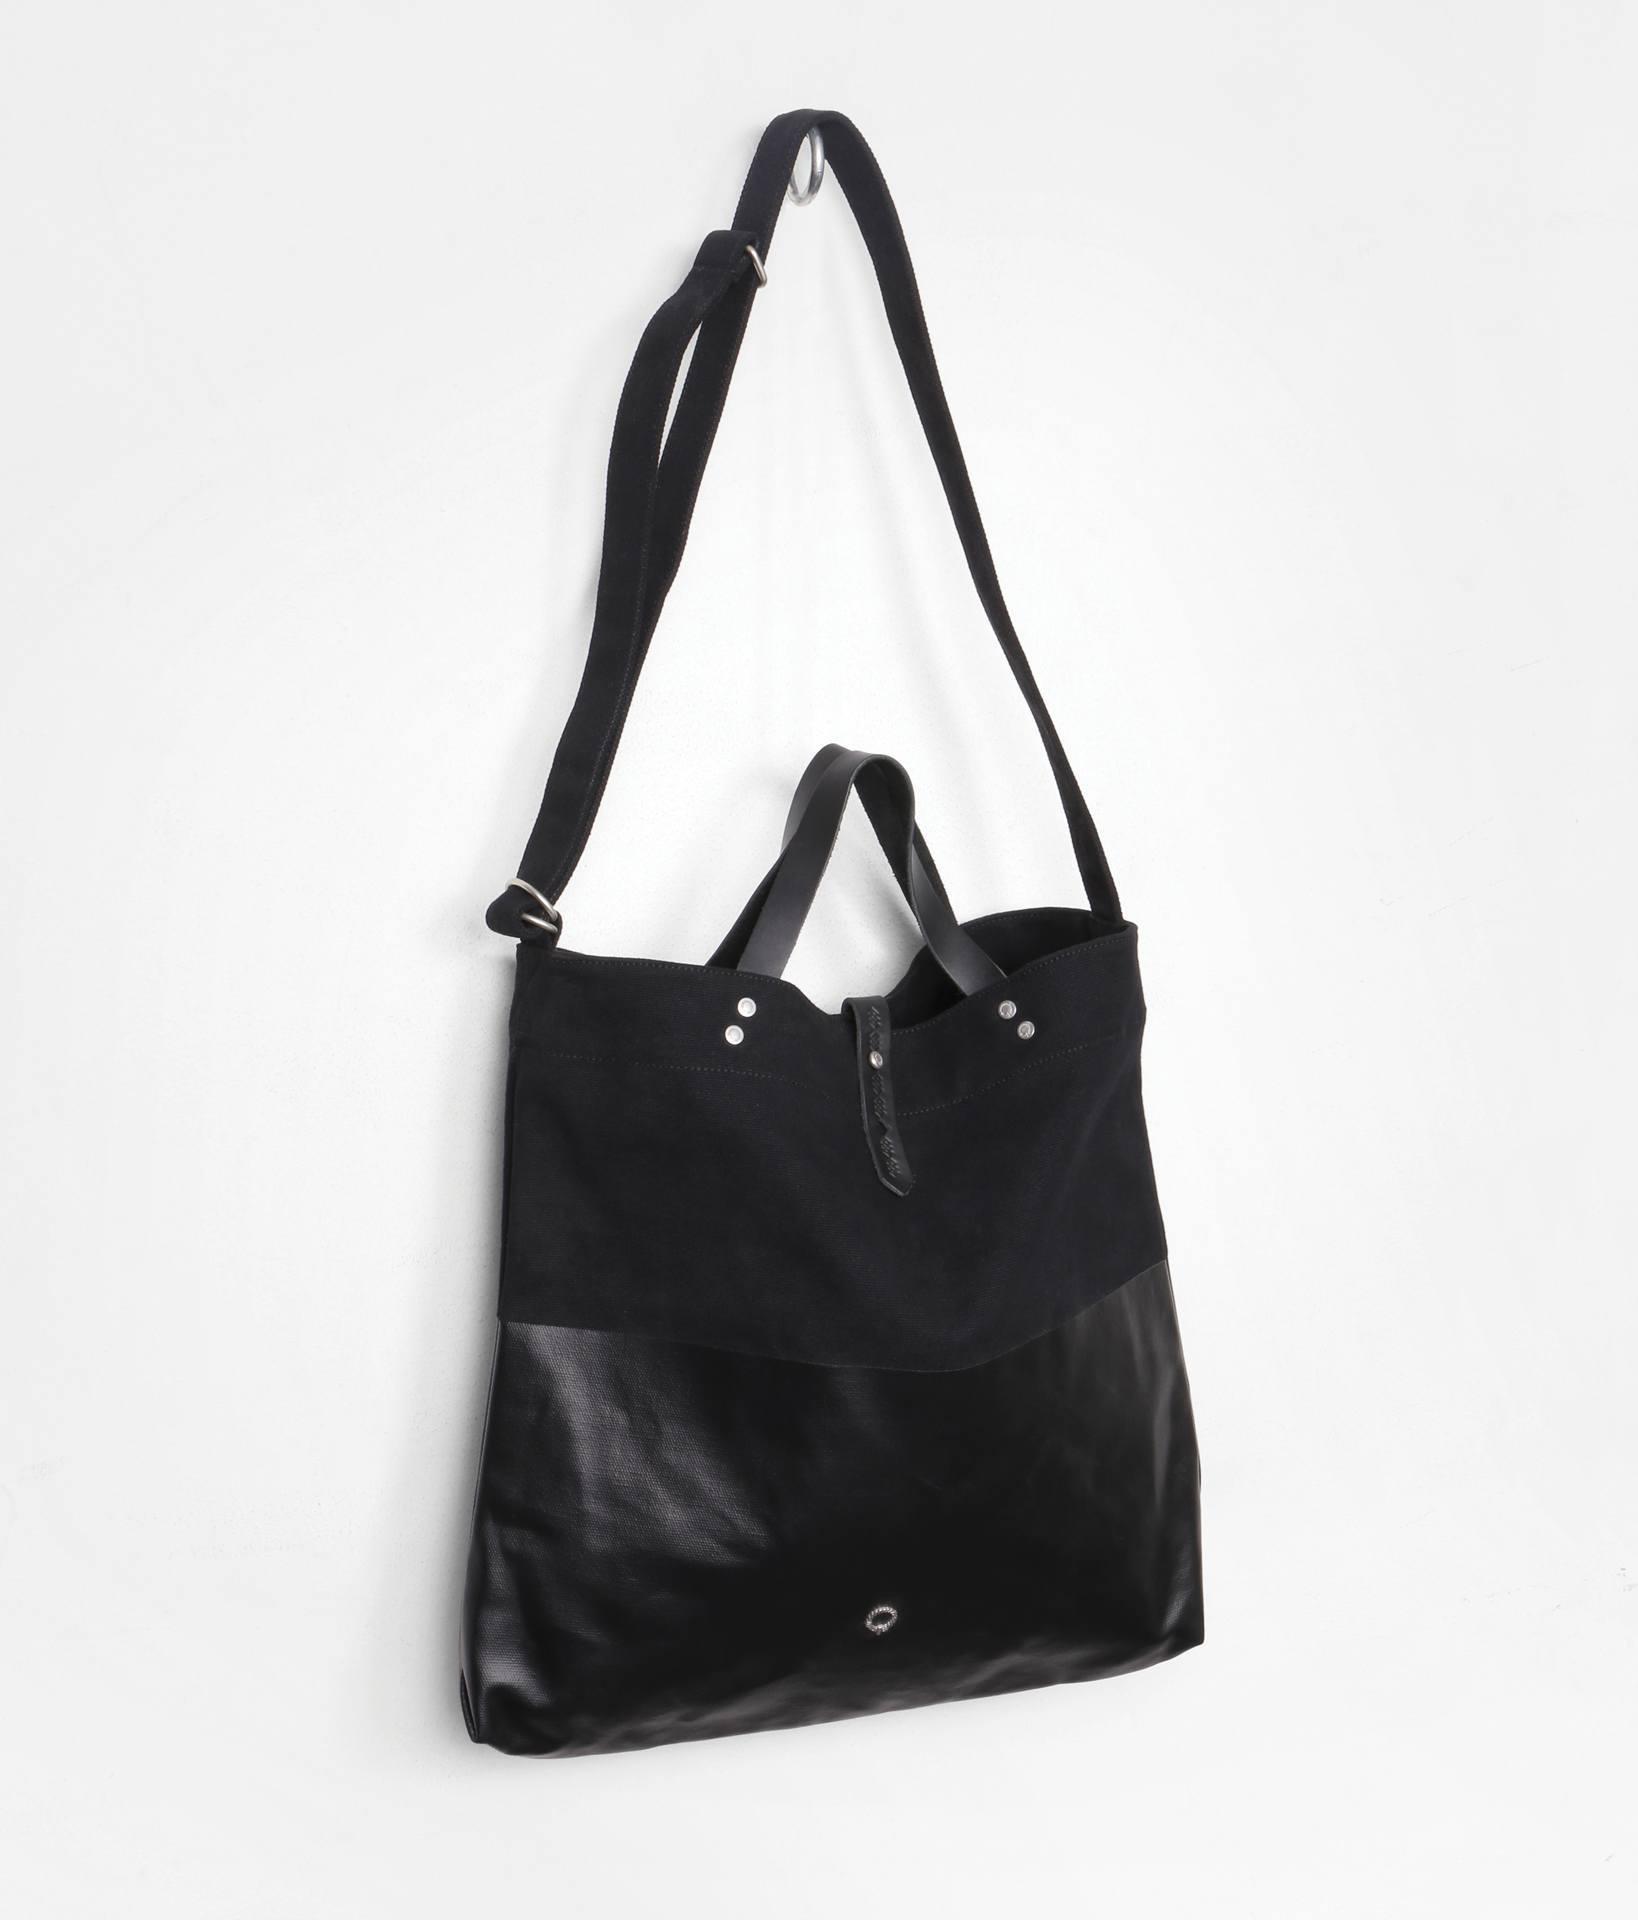 Canvas shoulder tote bag - Kavan